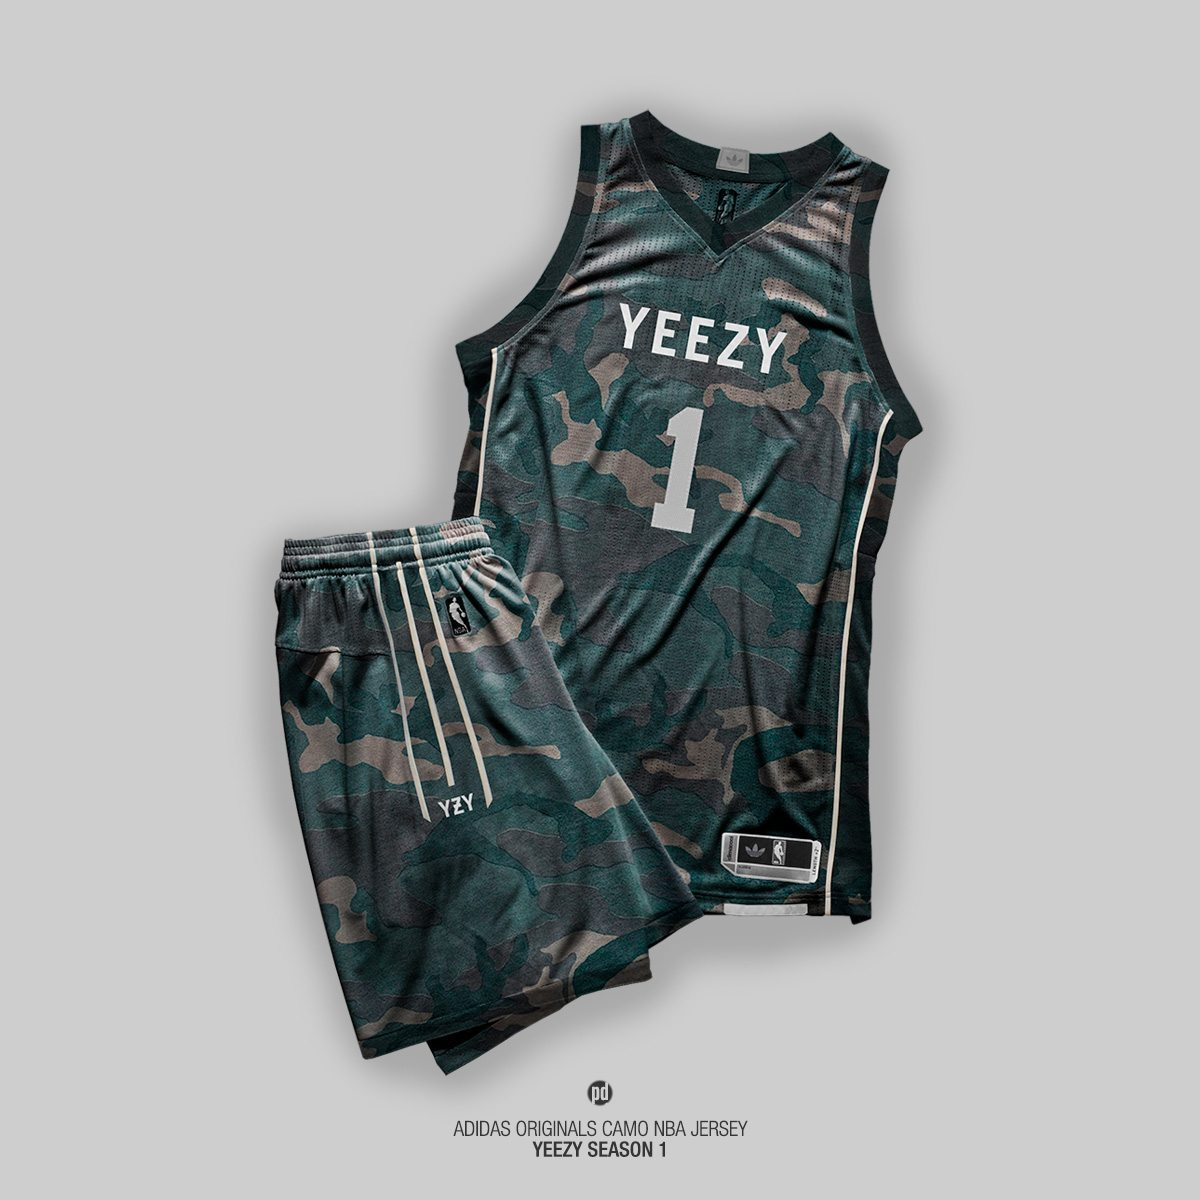 adidas Yeezy Season 1 Basketball Jerseys 2